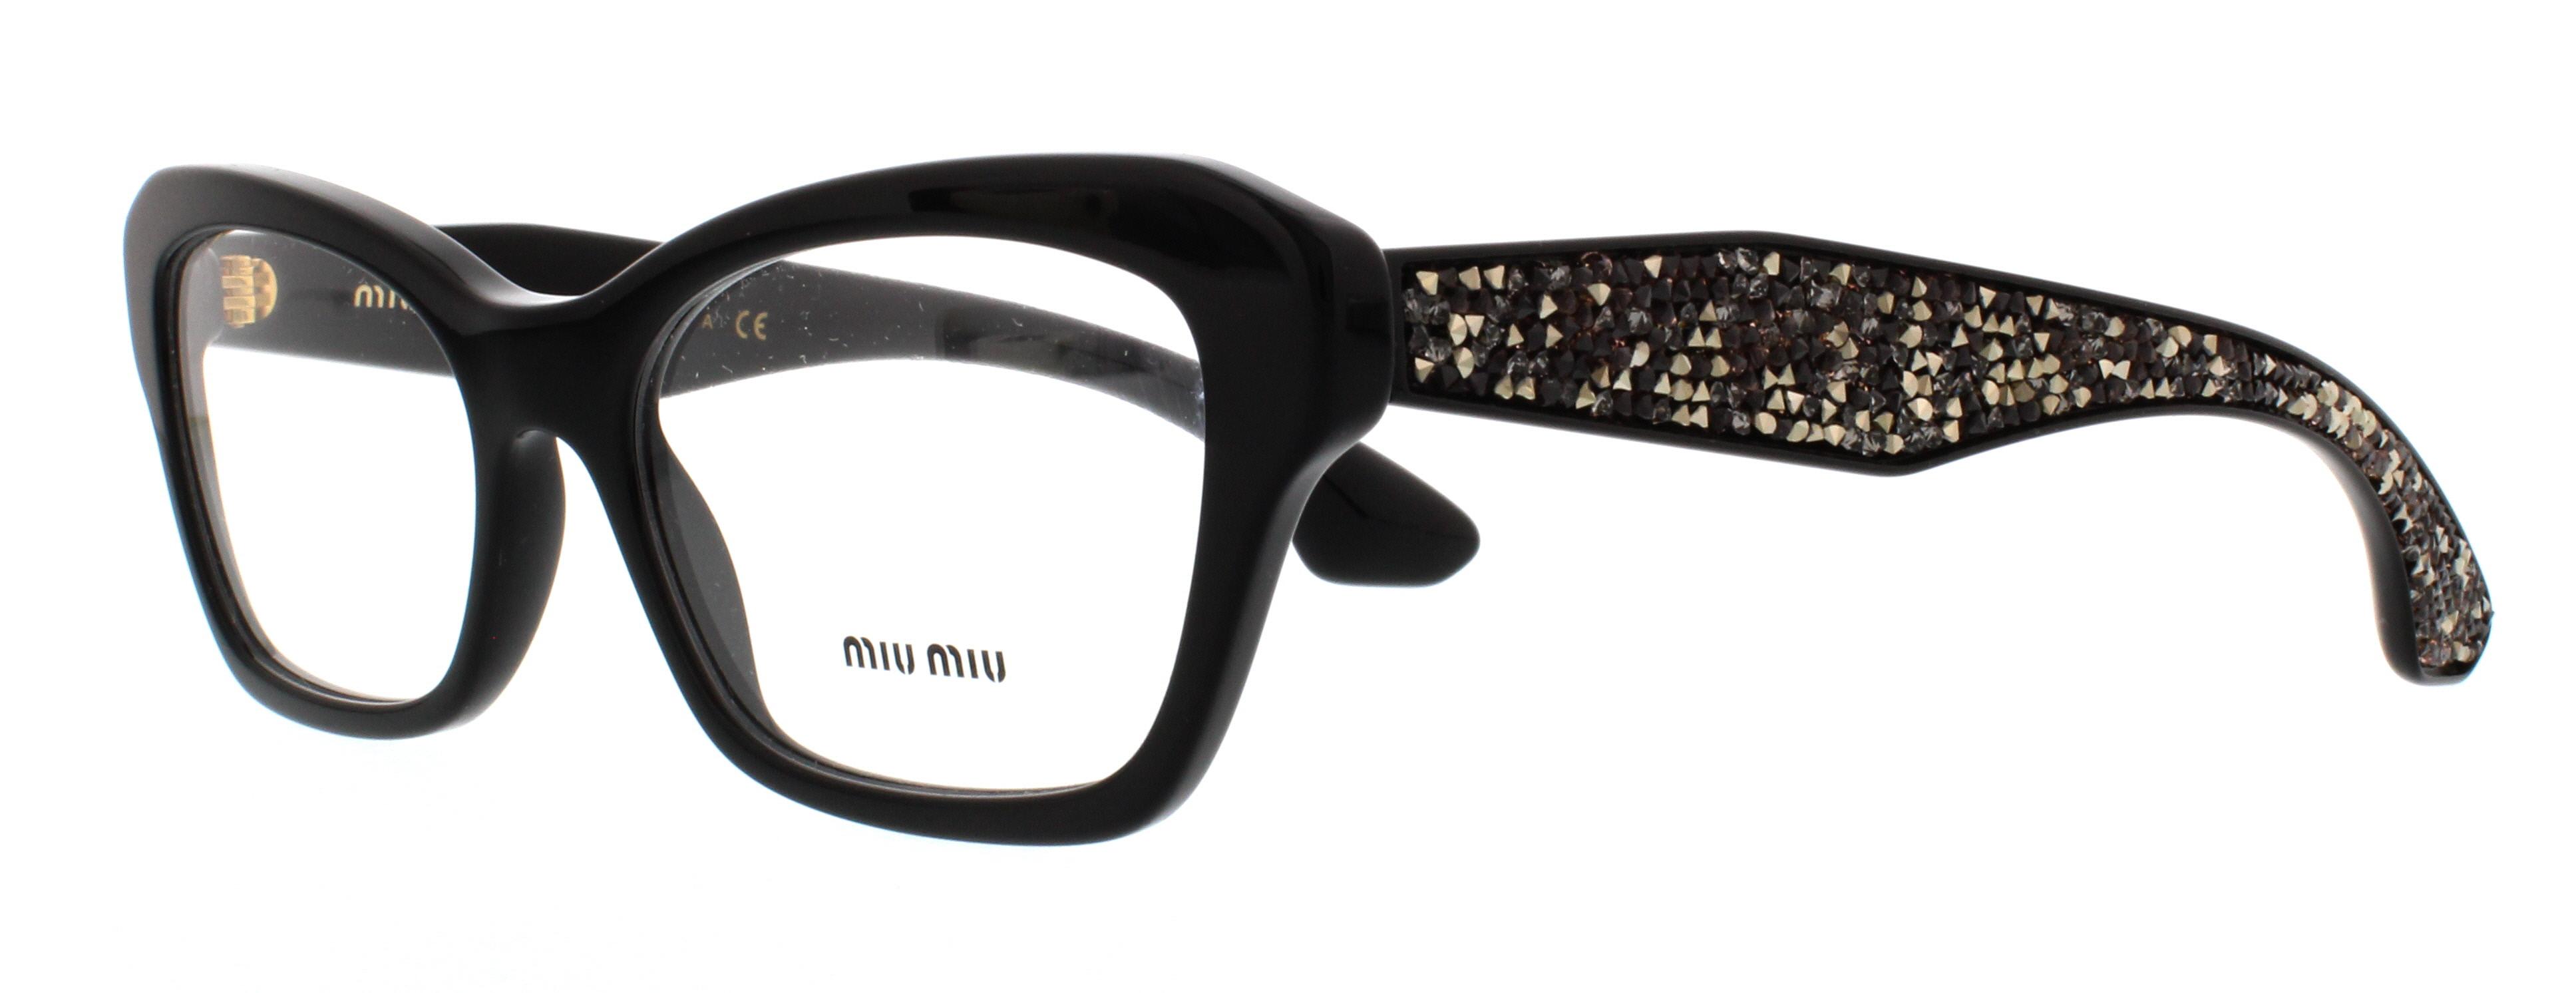 1ab1o1 black - Miu Miu Glasses Frames